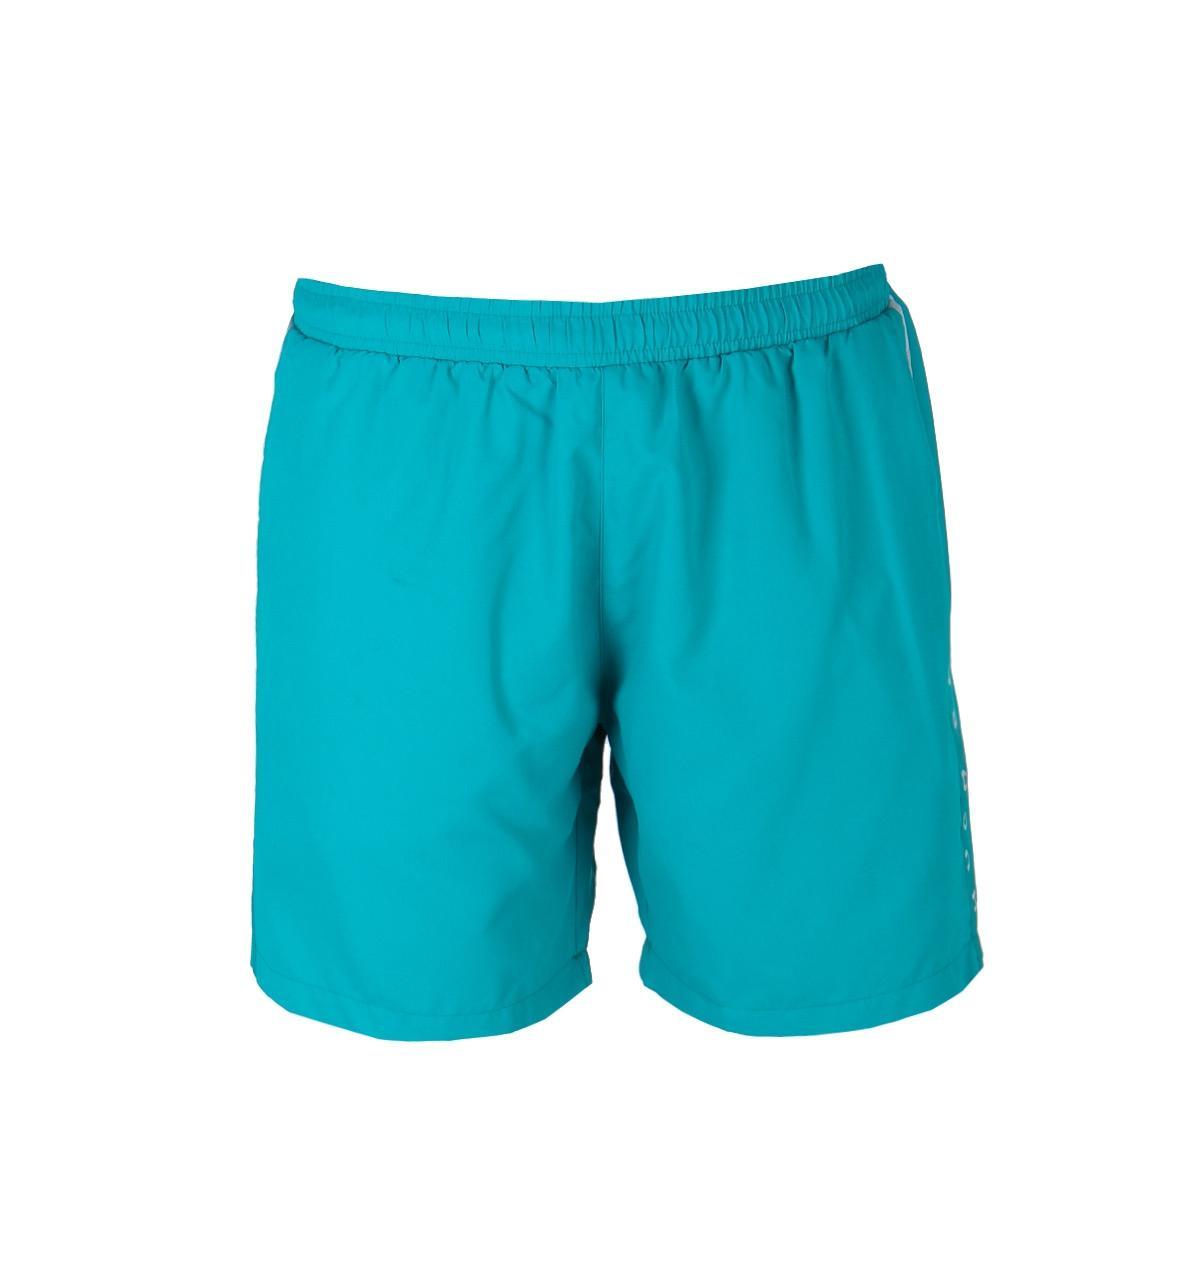 aef4d02d1 BOSS by Hugo Boss. Men's Blue Boss Loungewear Turquoise Seabream Swim Shorts